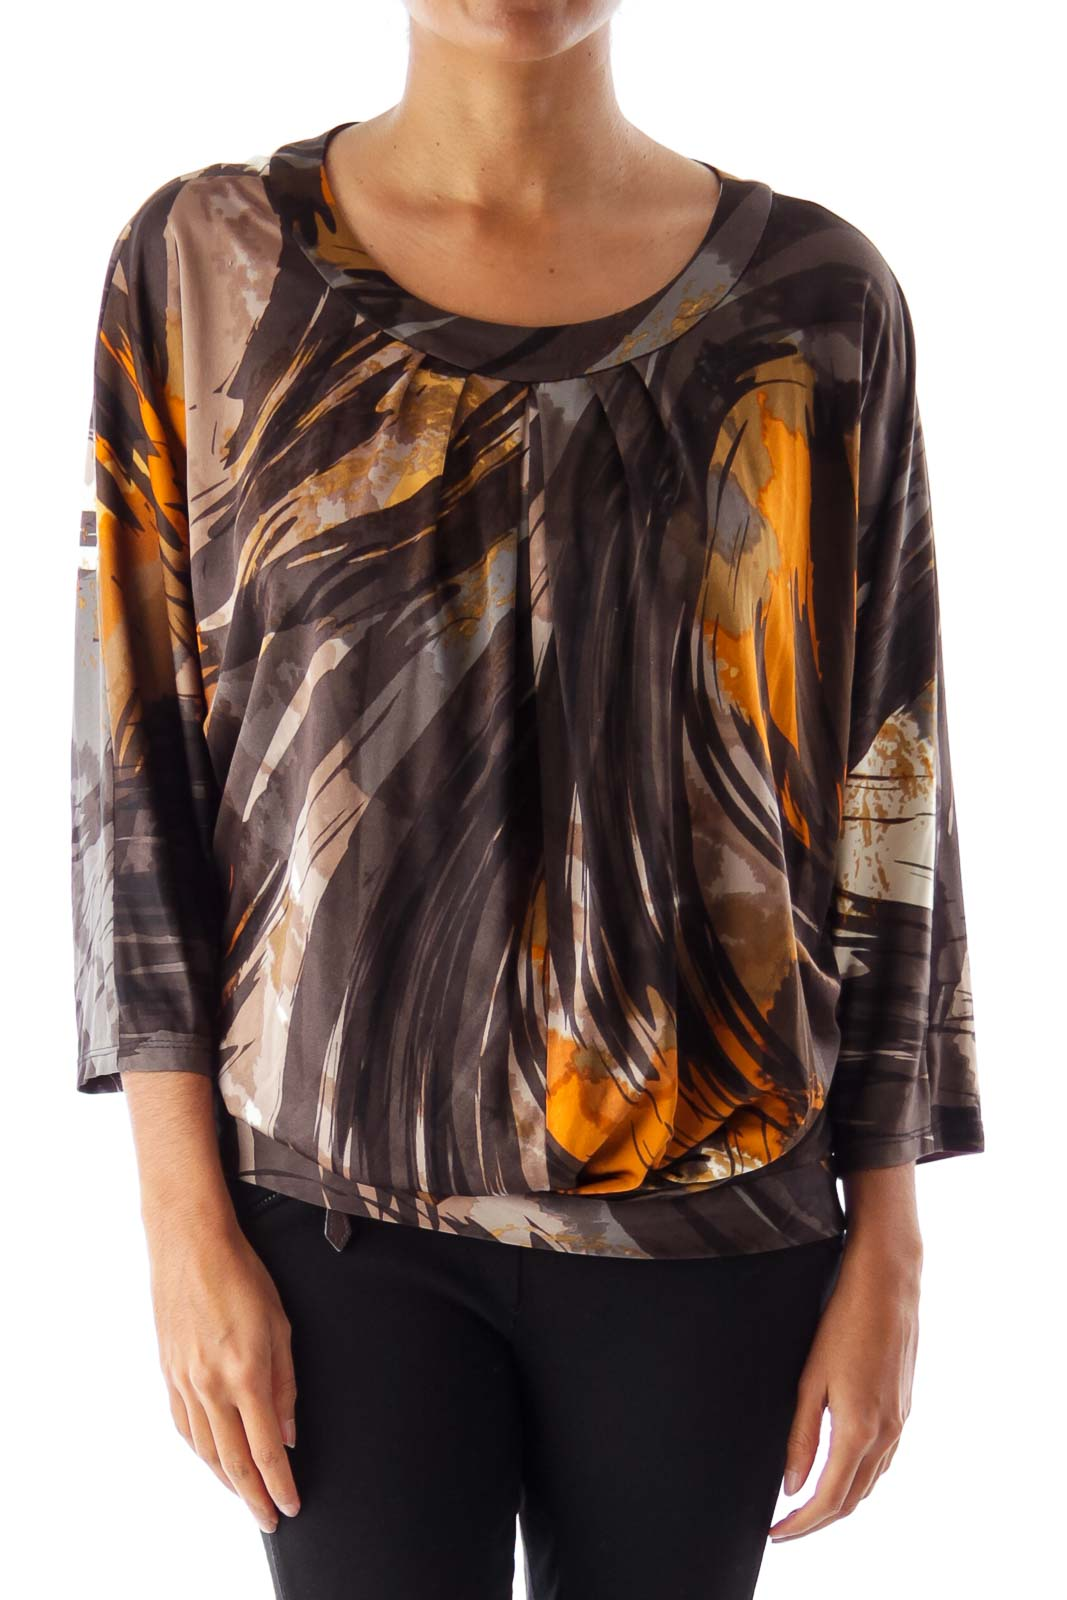 Black & Brown Print Shirt Front